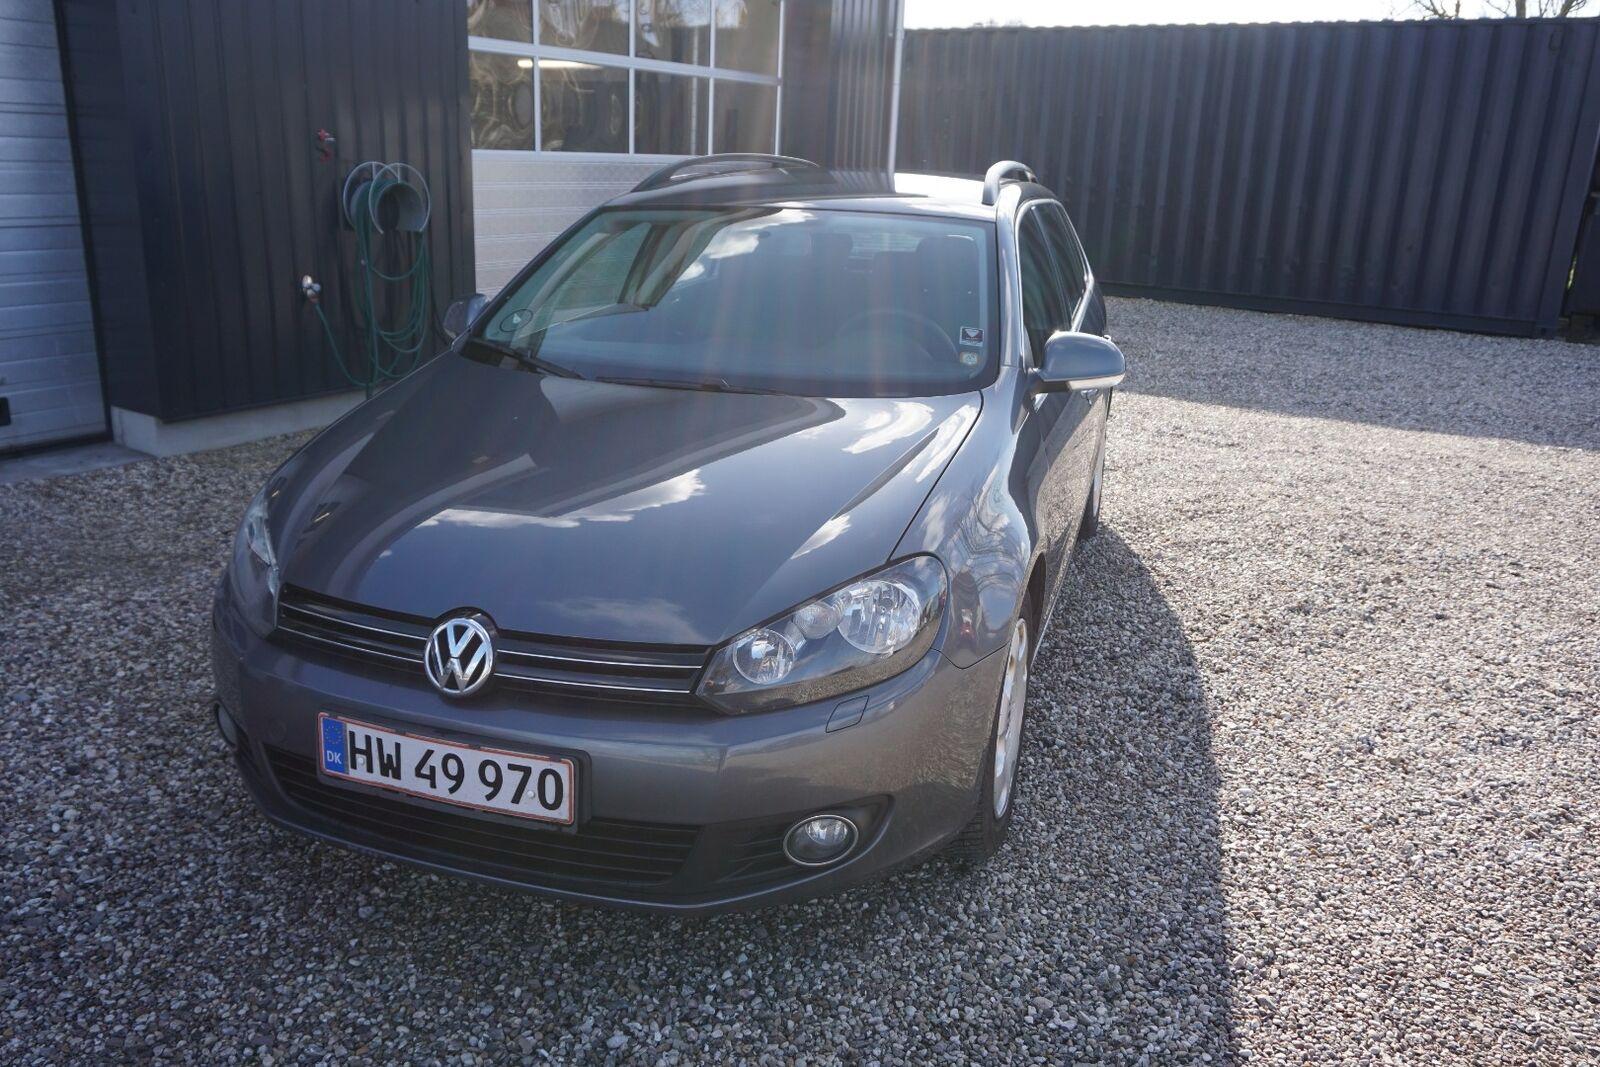 VW Golf VI 1,6 TDi 105 Comfortl. Variant BMT 5d - 65.000 kr.